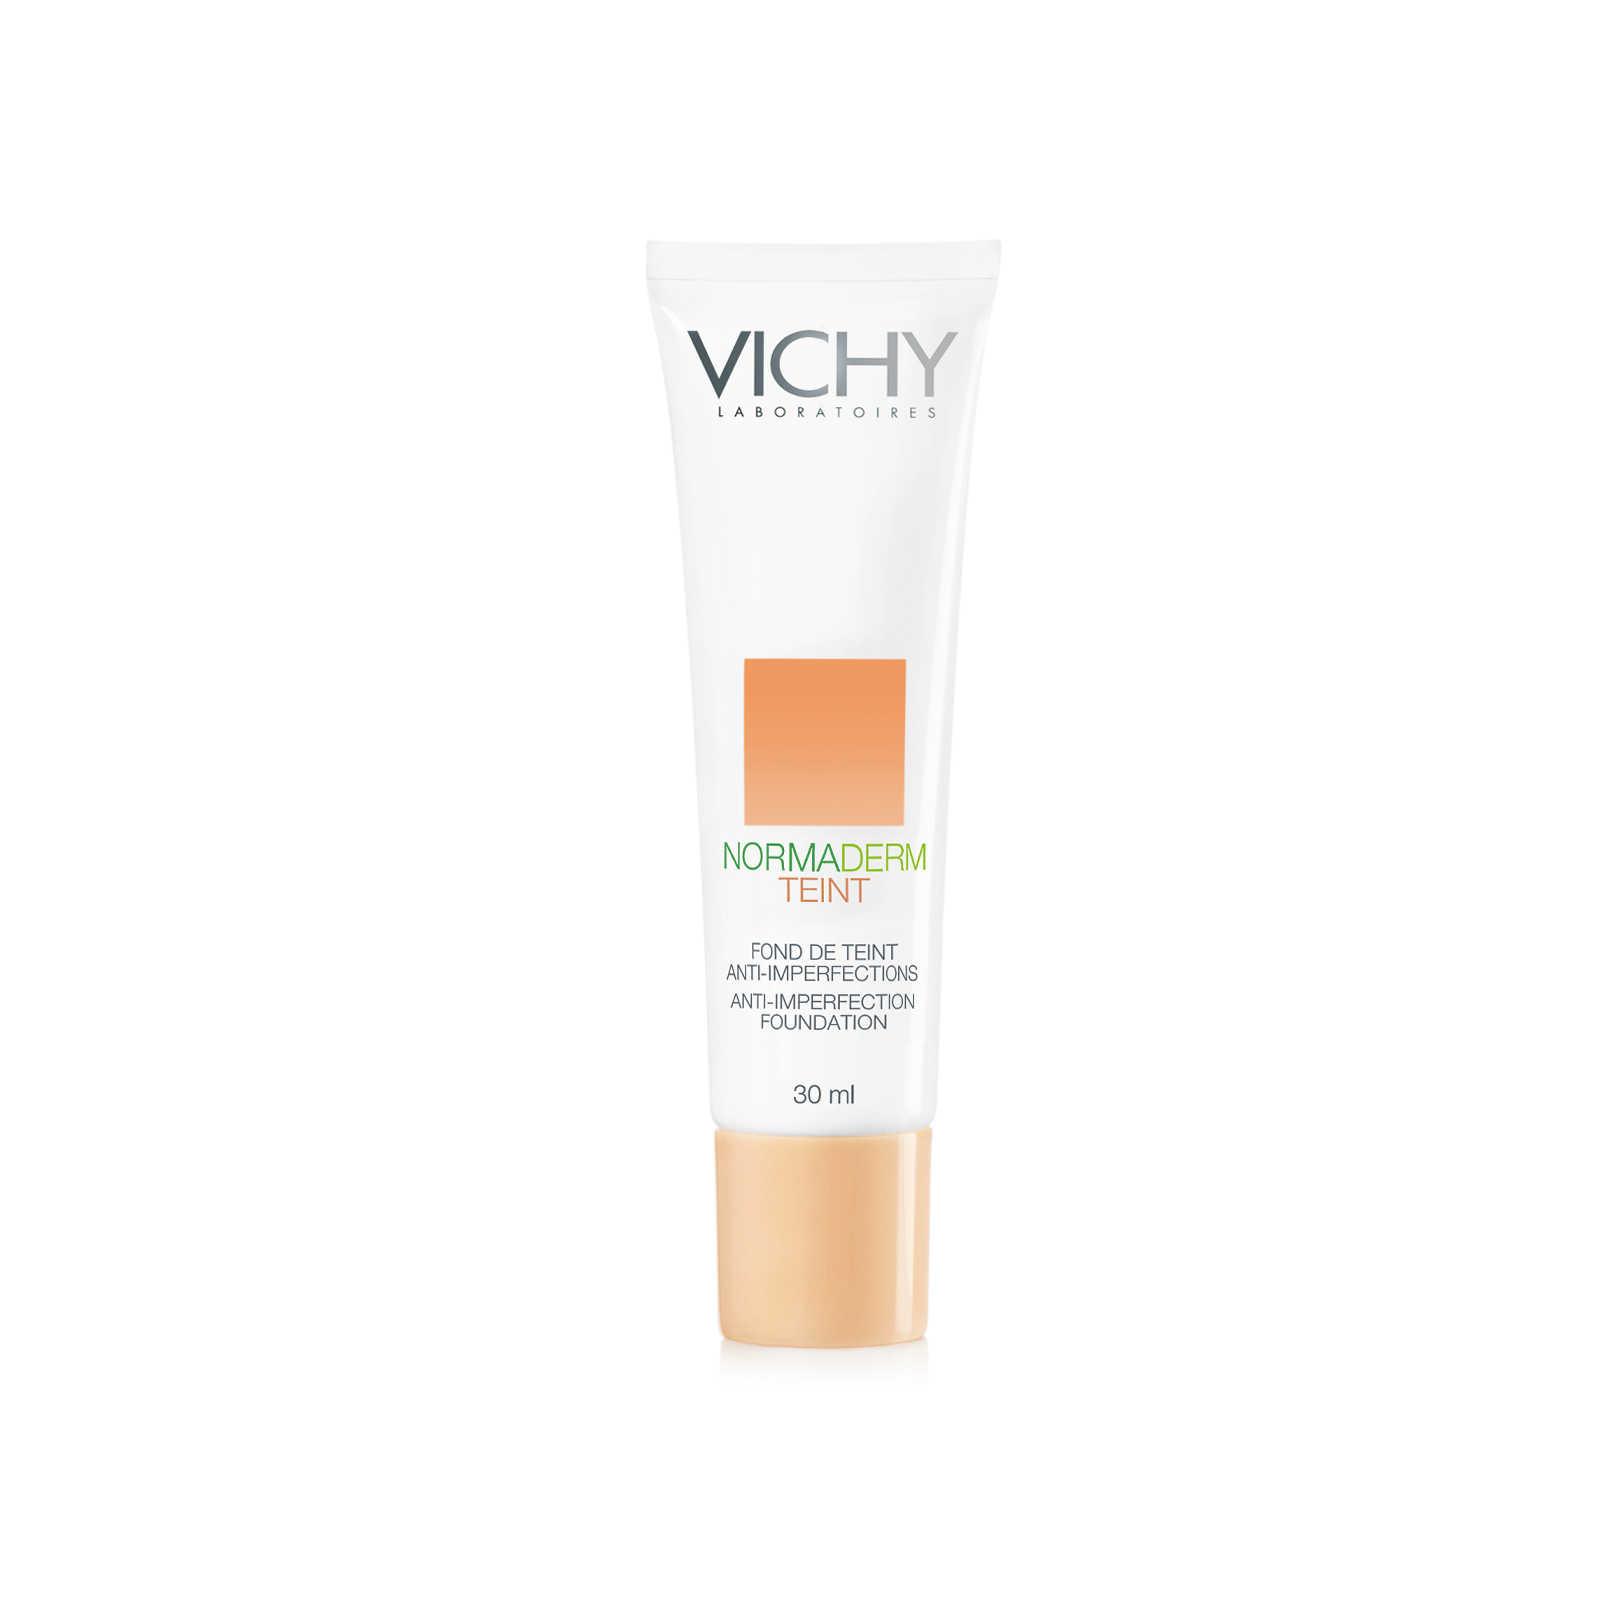 Vichy - Fondotinta Anti-imperfezioni - Normaderm Teint - 15 Opal